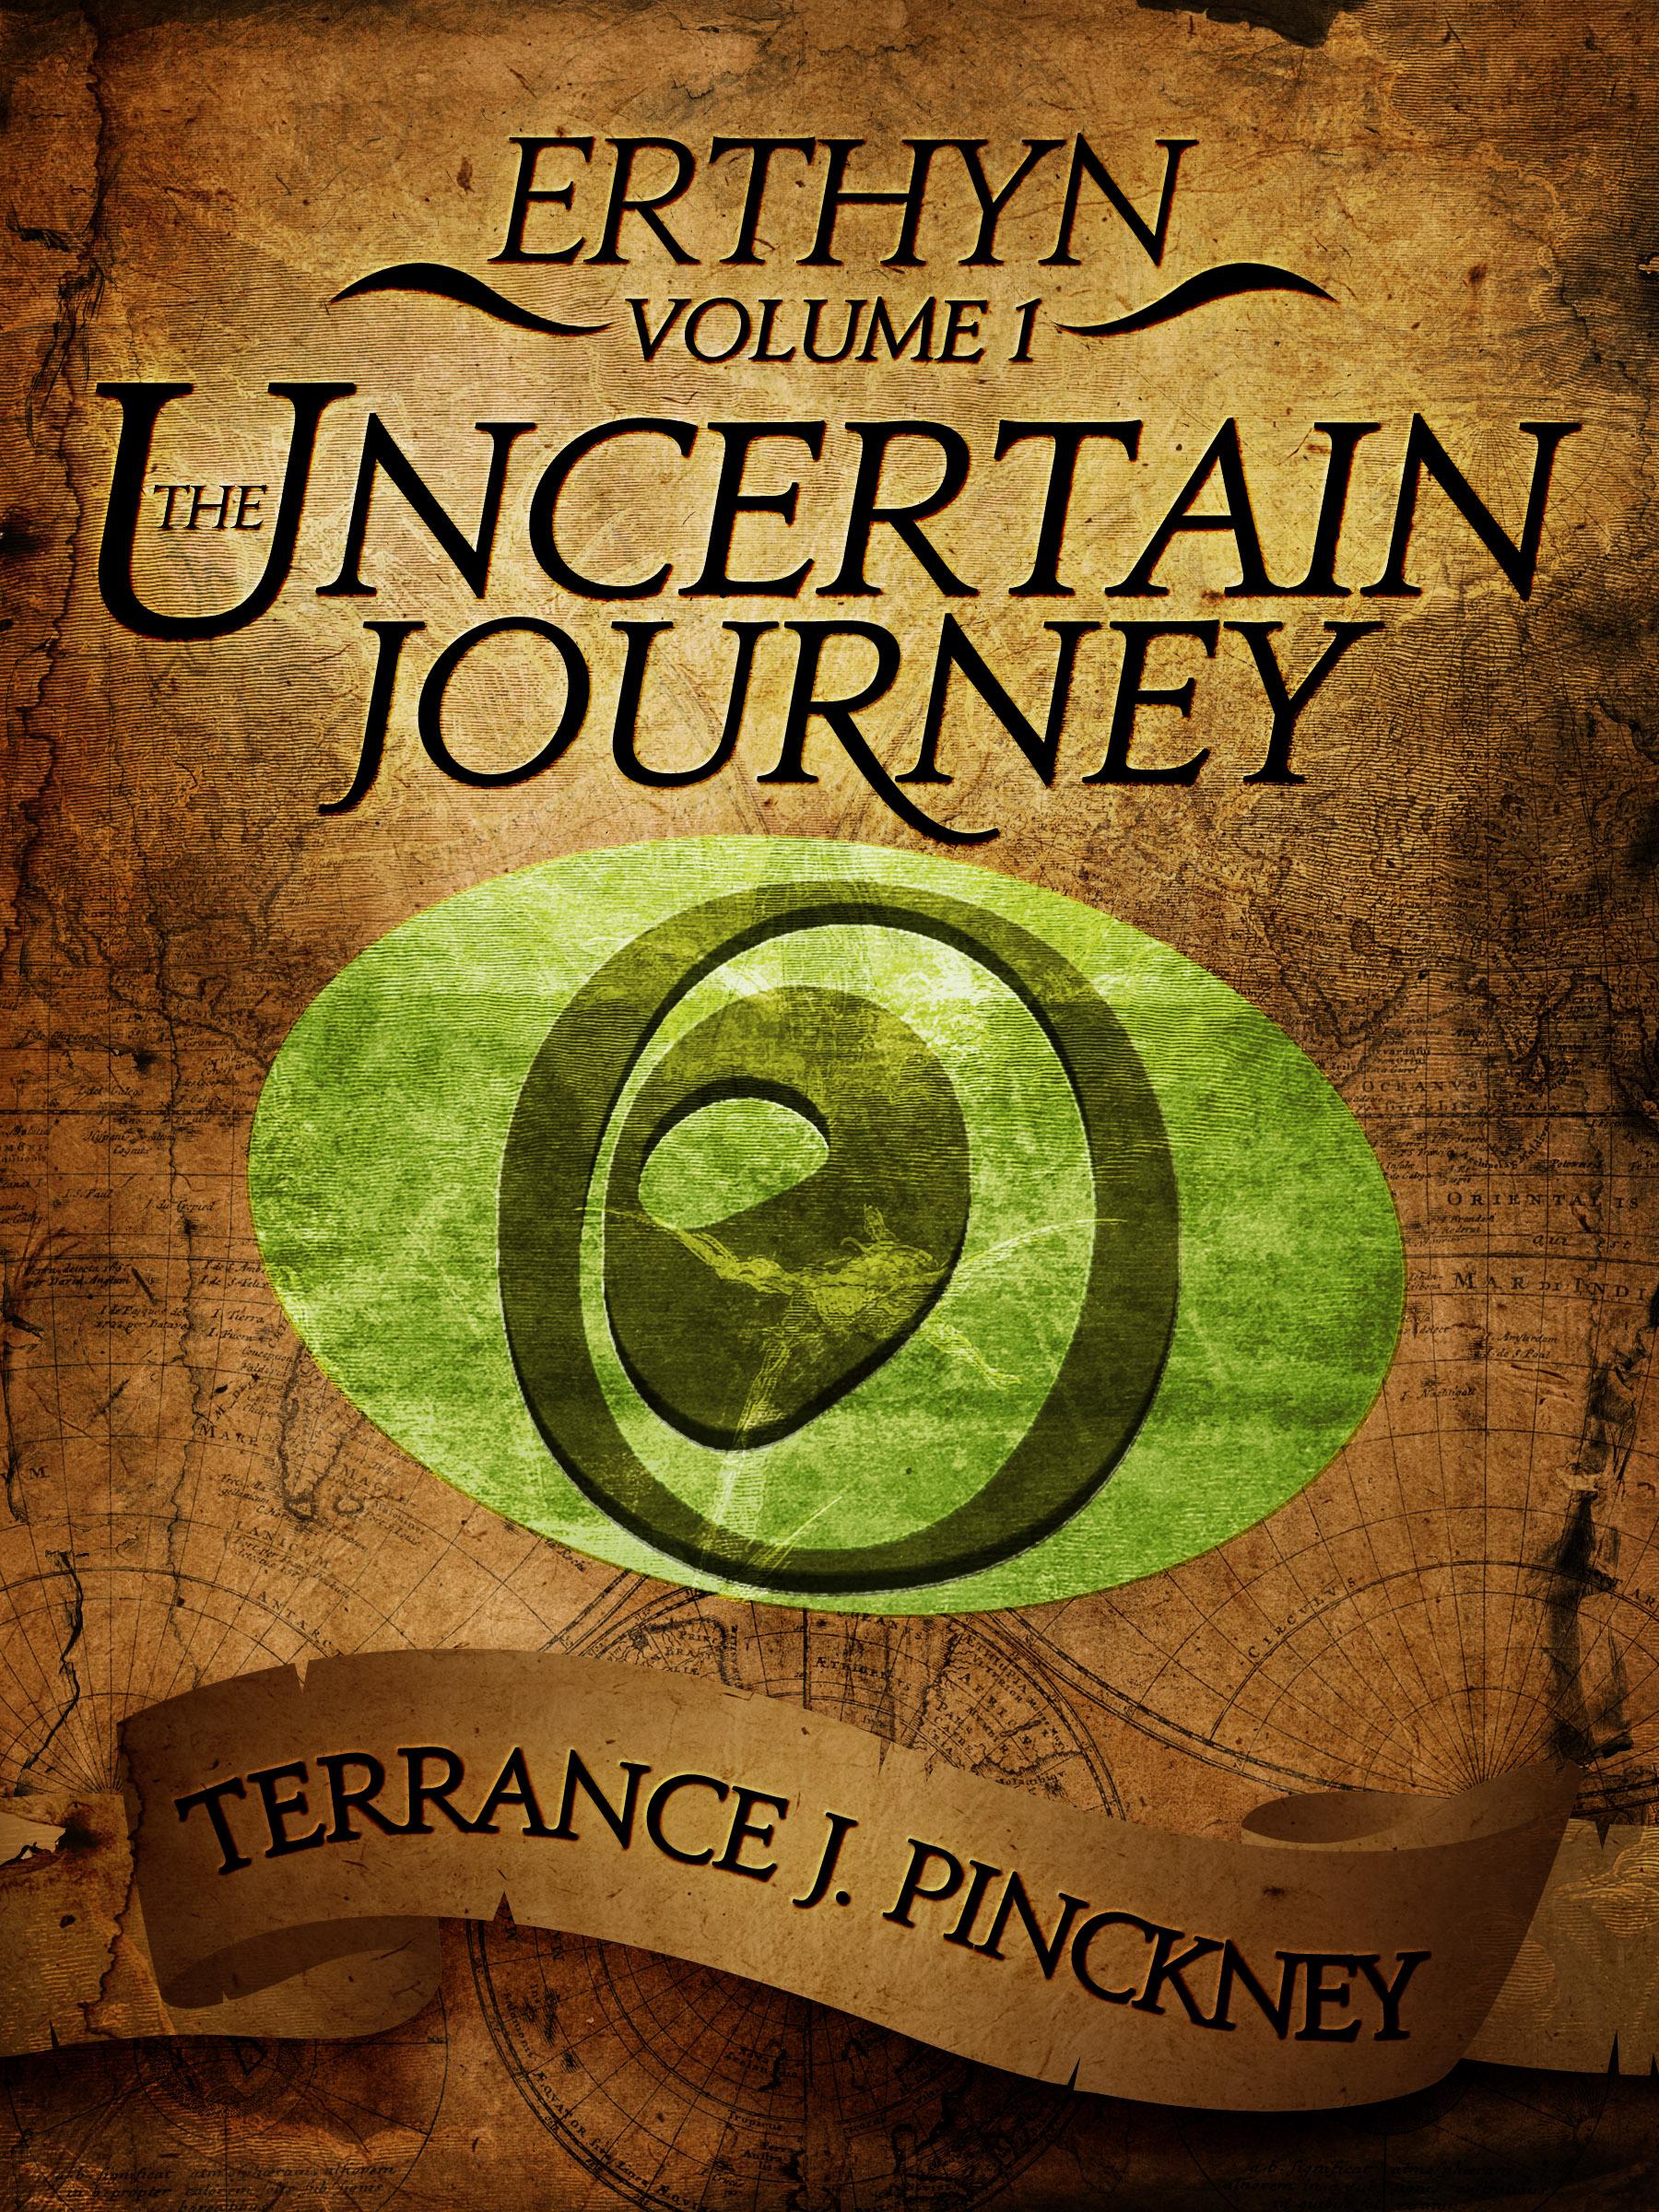 Erthyn Volume 1 The Uncertain Journey